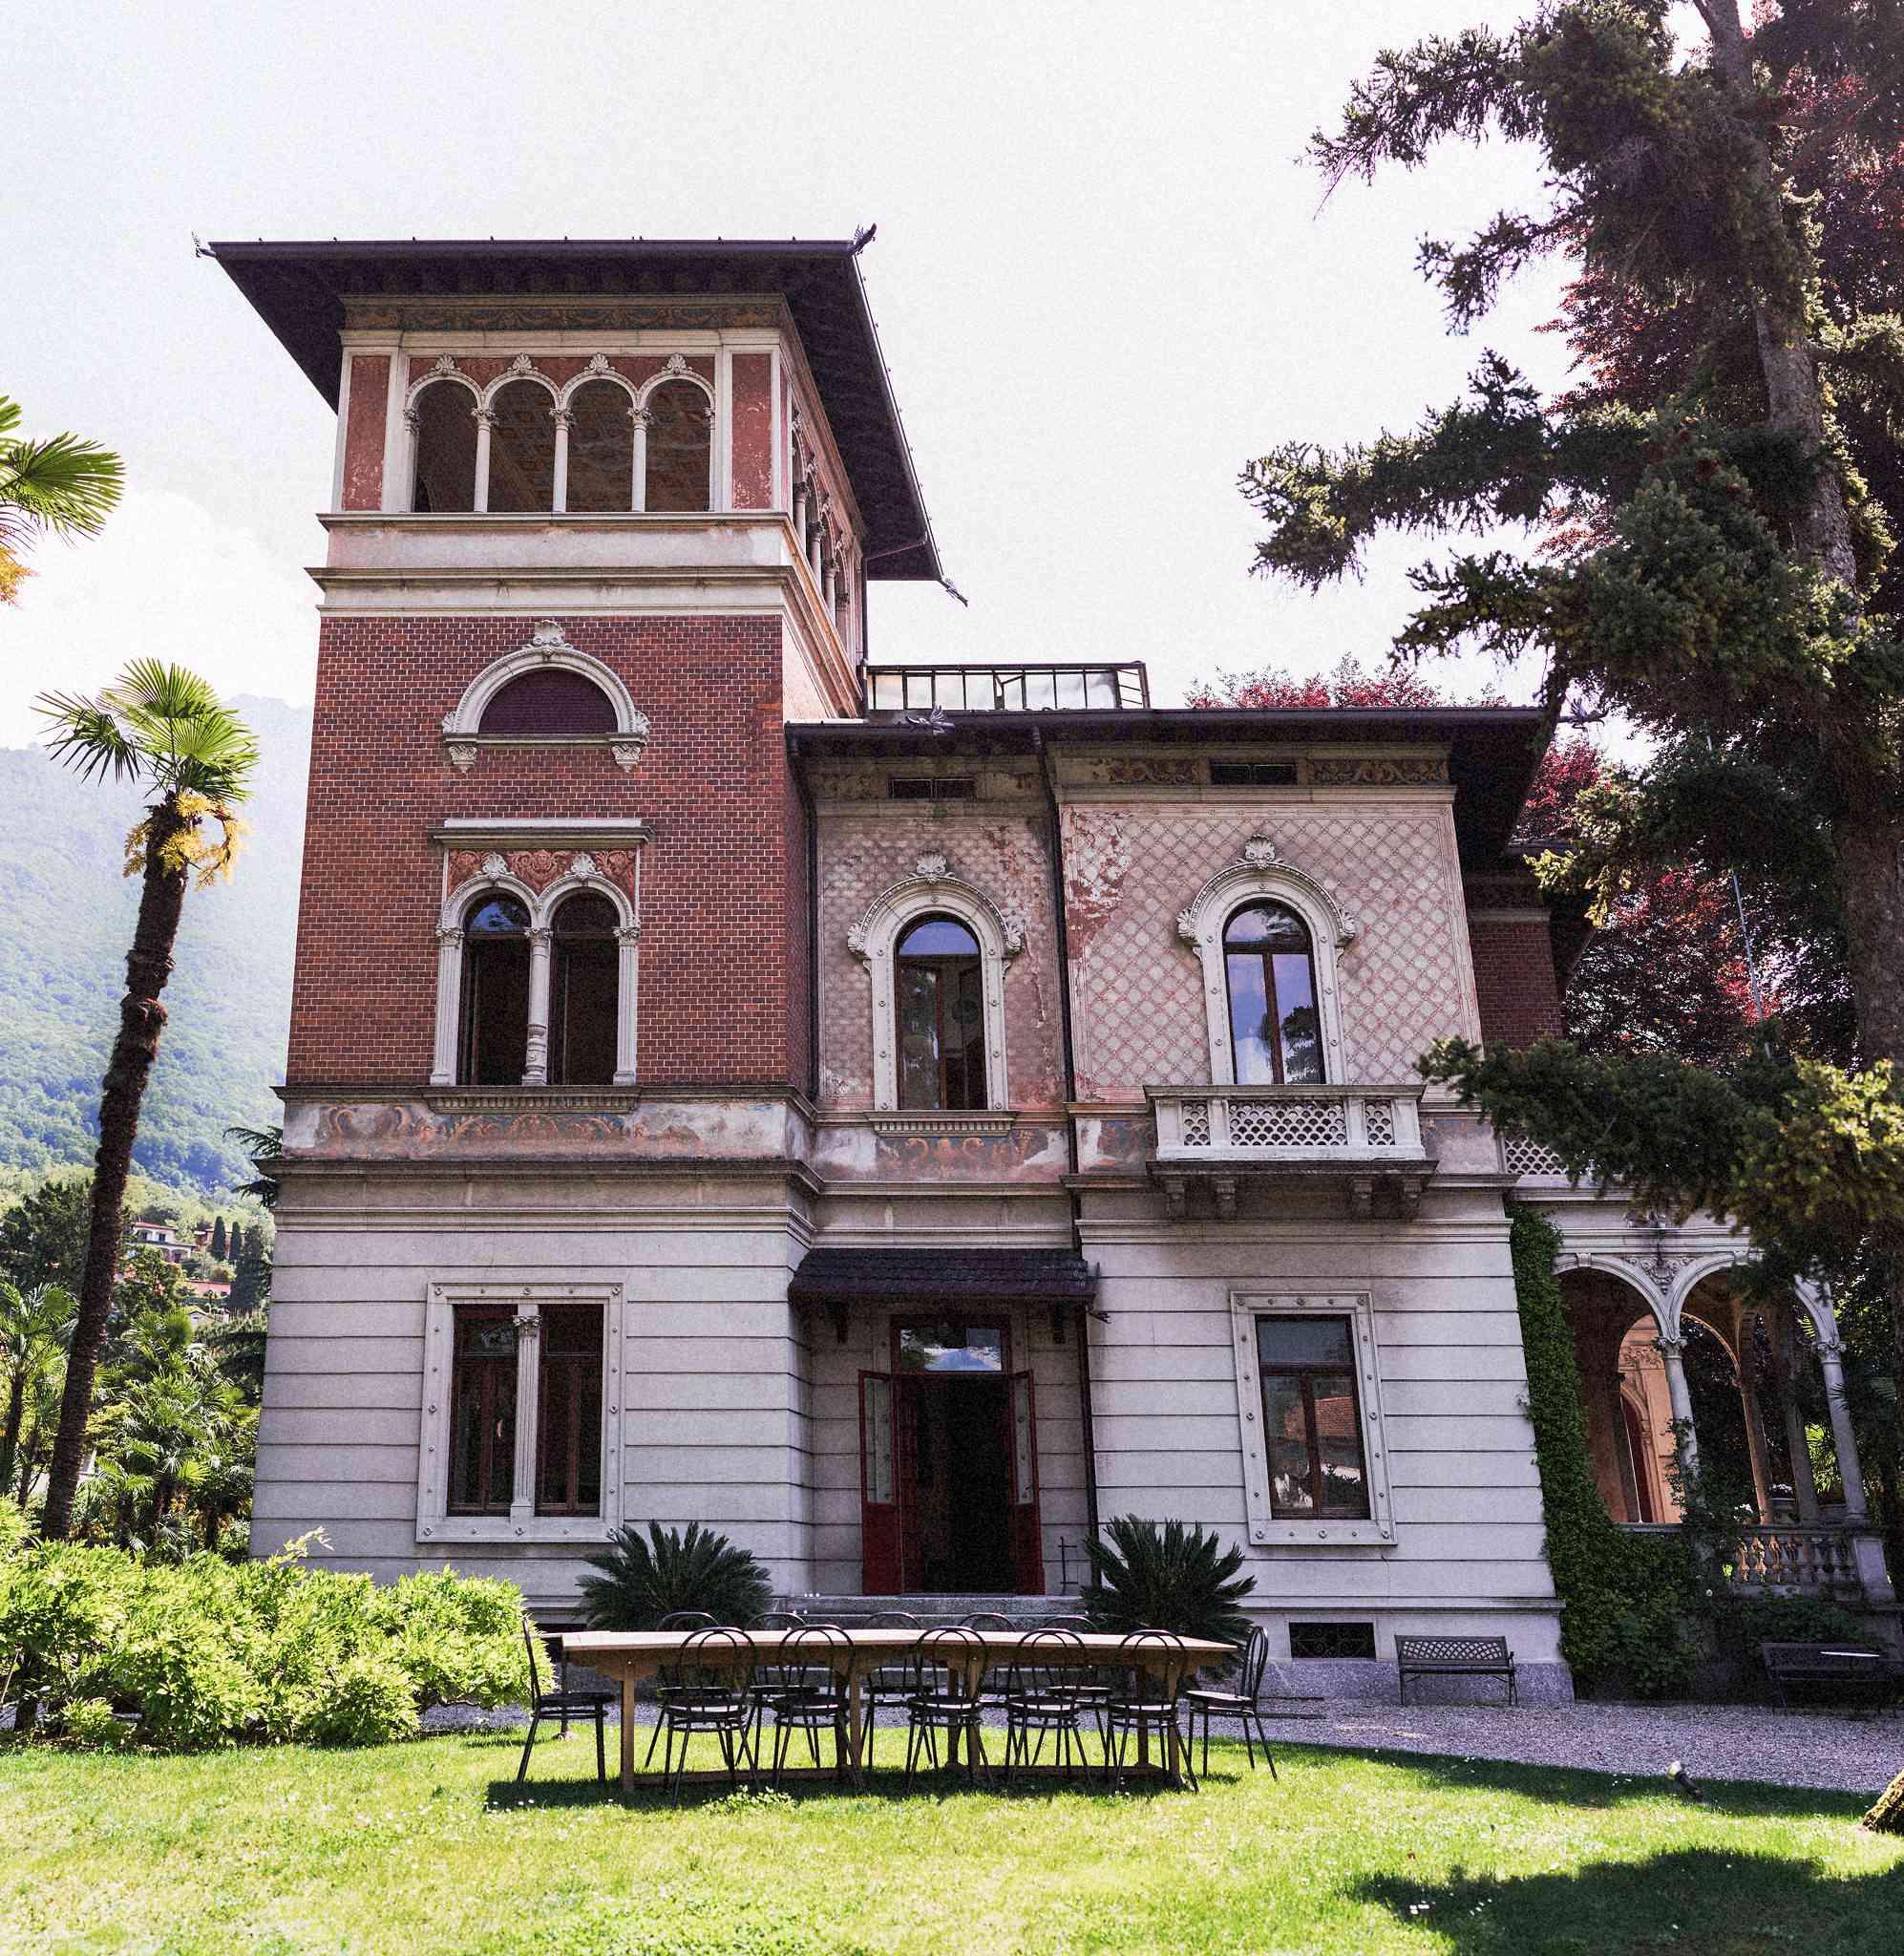 <p>Villa on Lake Como</p><br><br>